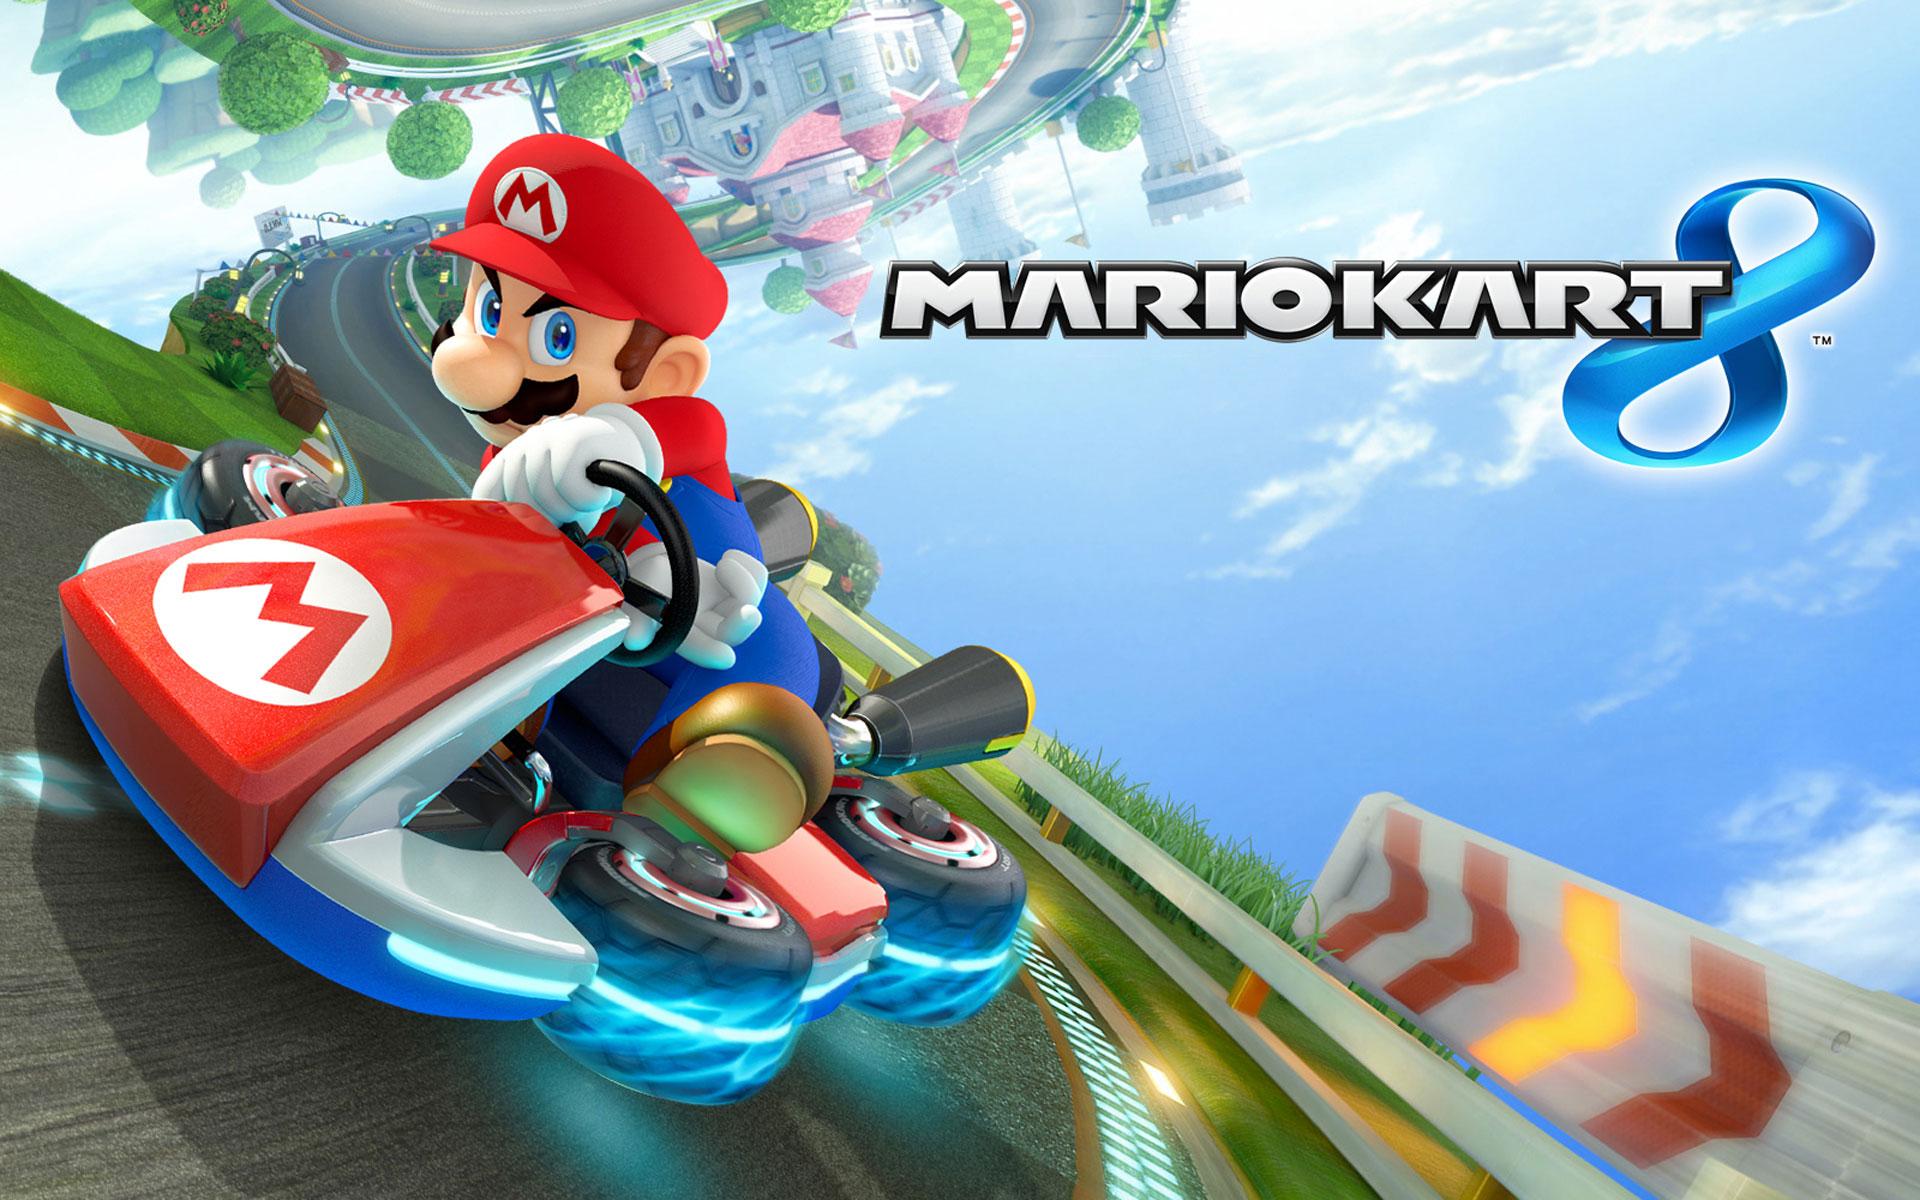 Mario Kart 8 Boxart Wallpaper